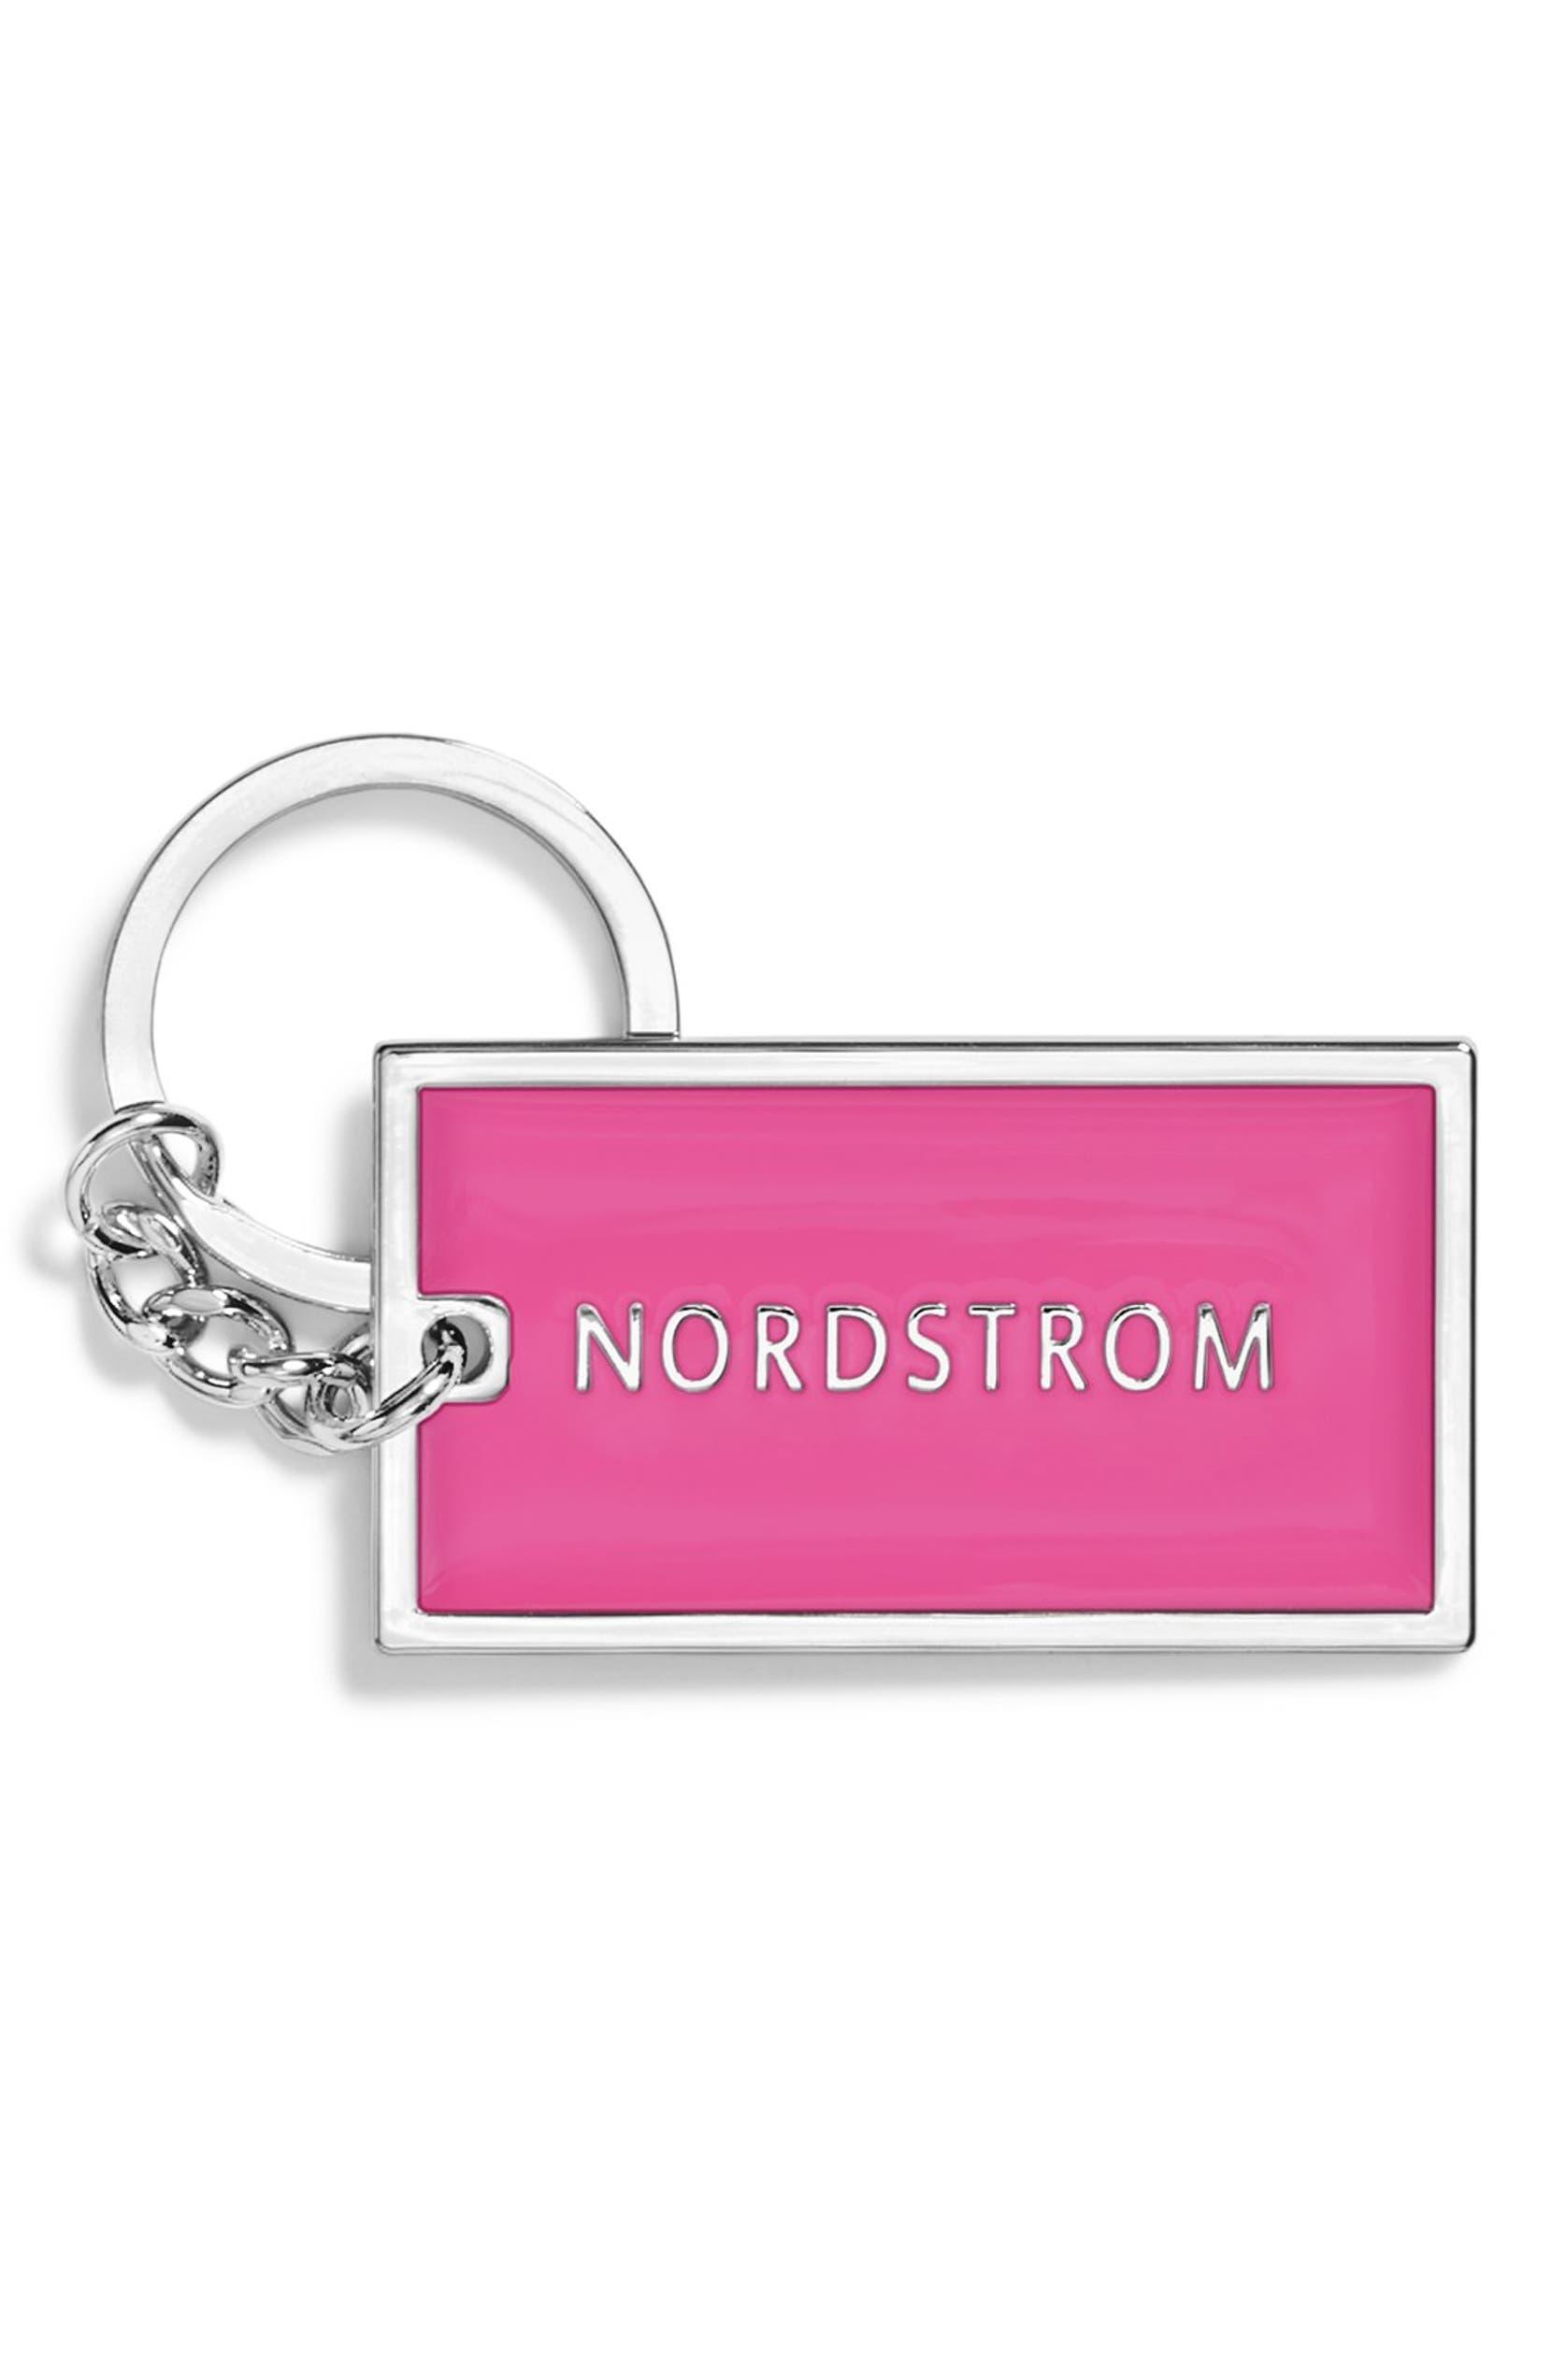 Spa Nordstrom Gift Card Nordstrom